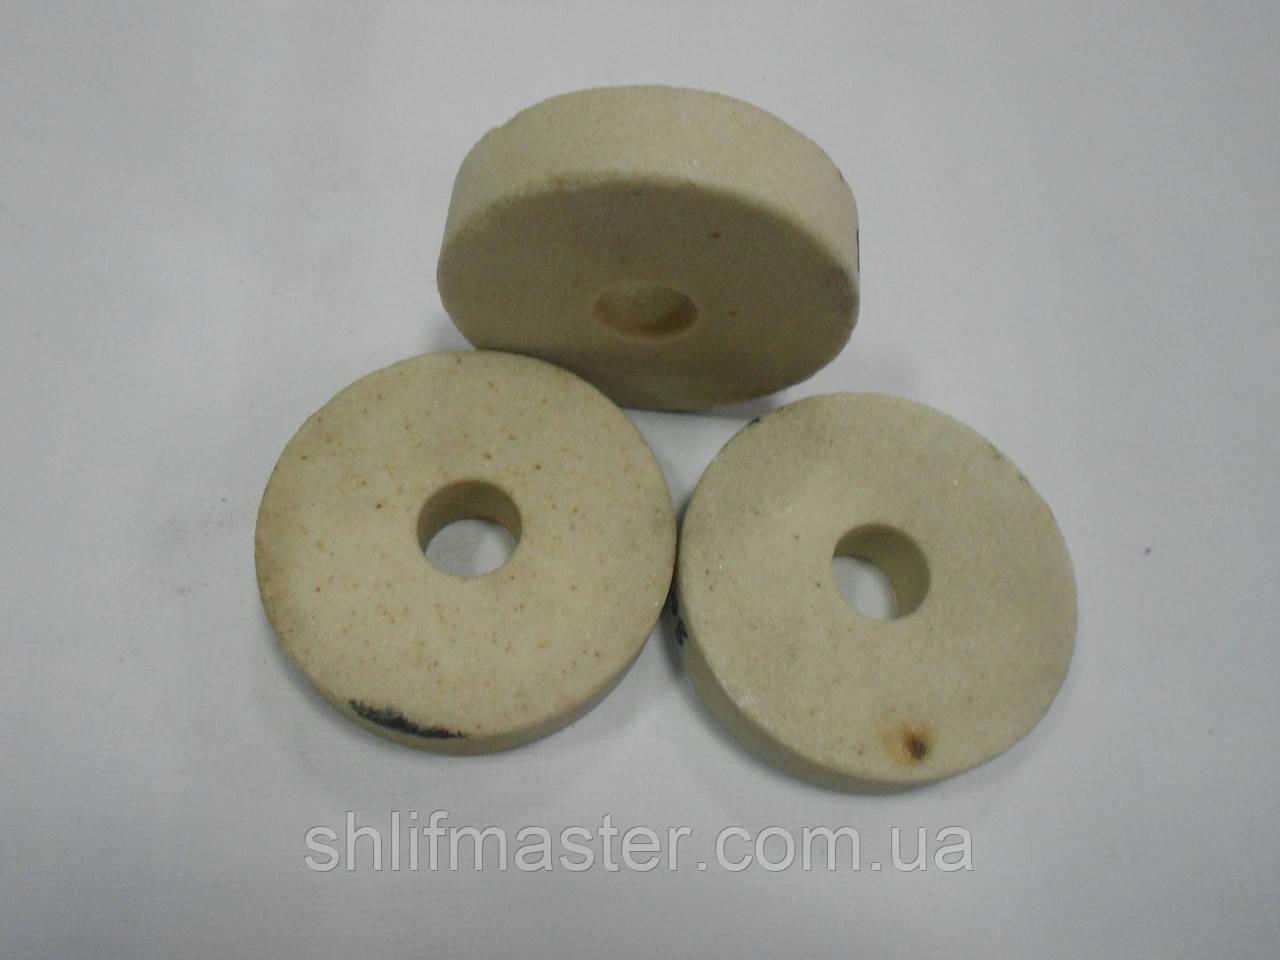 Абразивный круг шлифовальный (электрокорунд белый) 25А ПП 63Х63Х20 40 С1